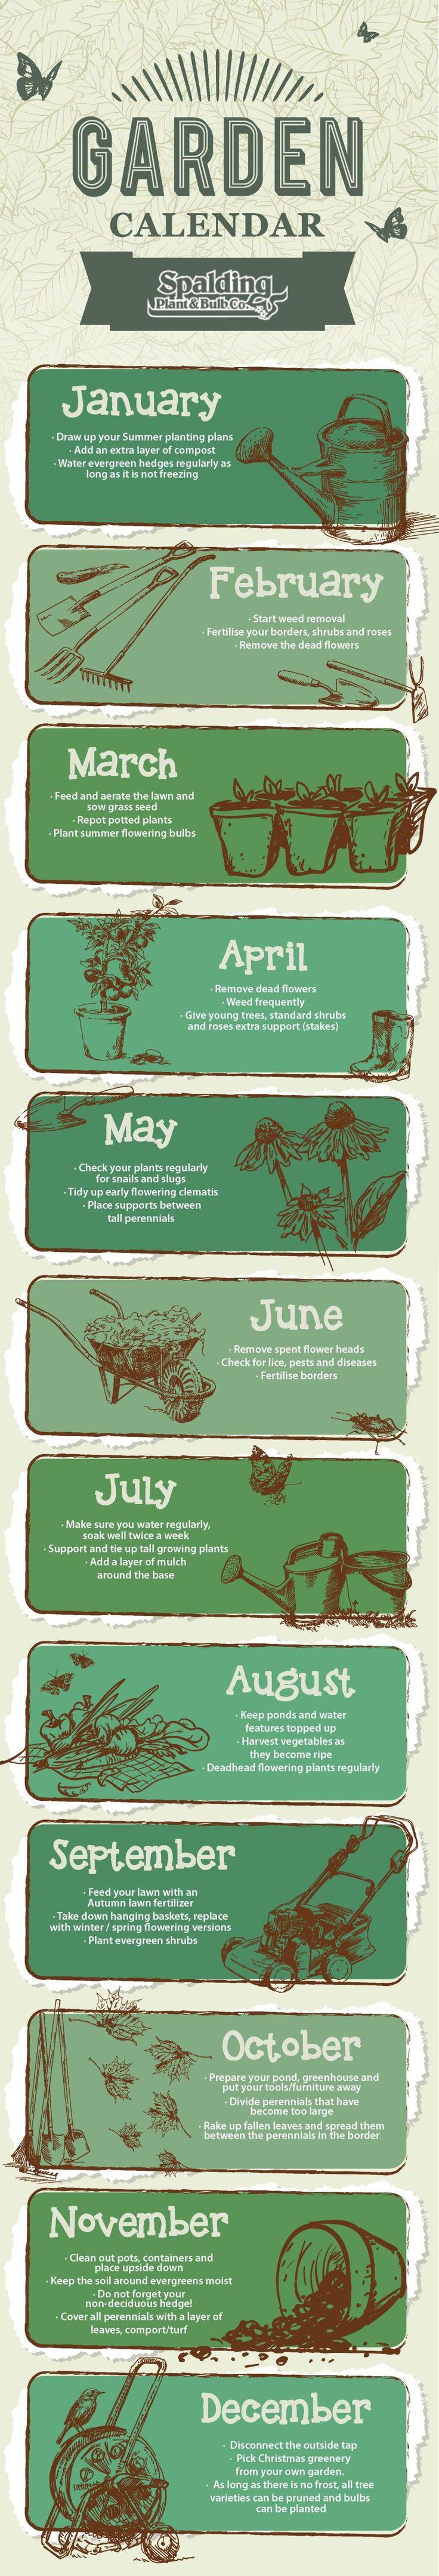 Spalding Gardening Calendar